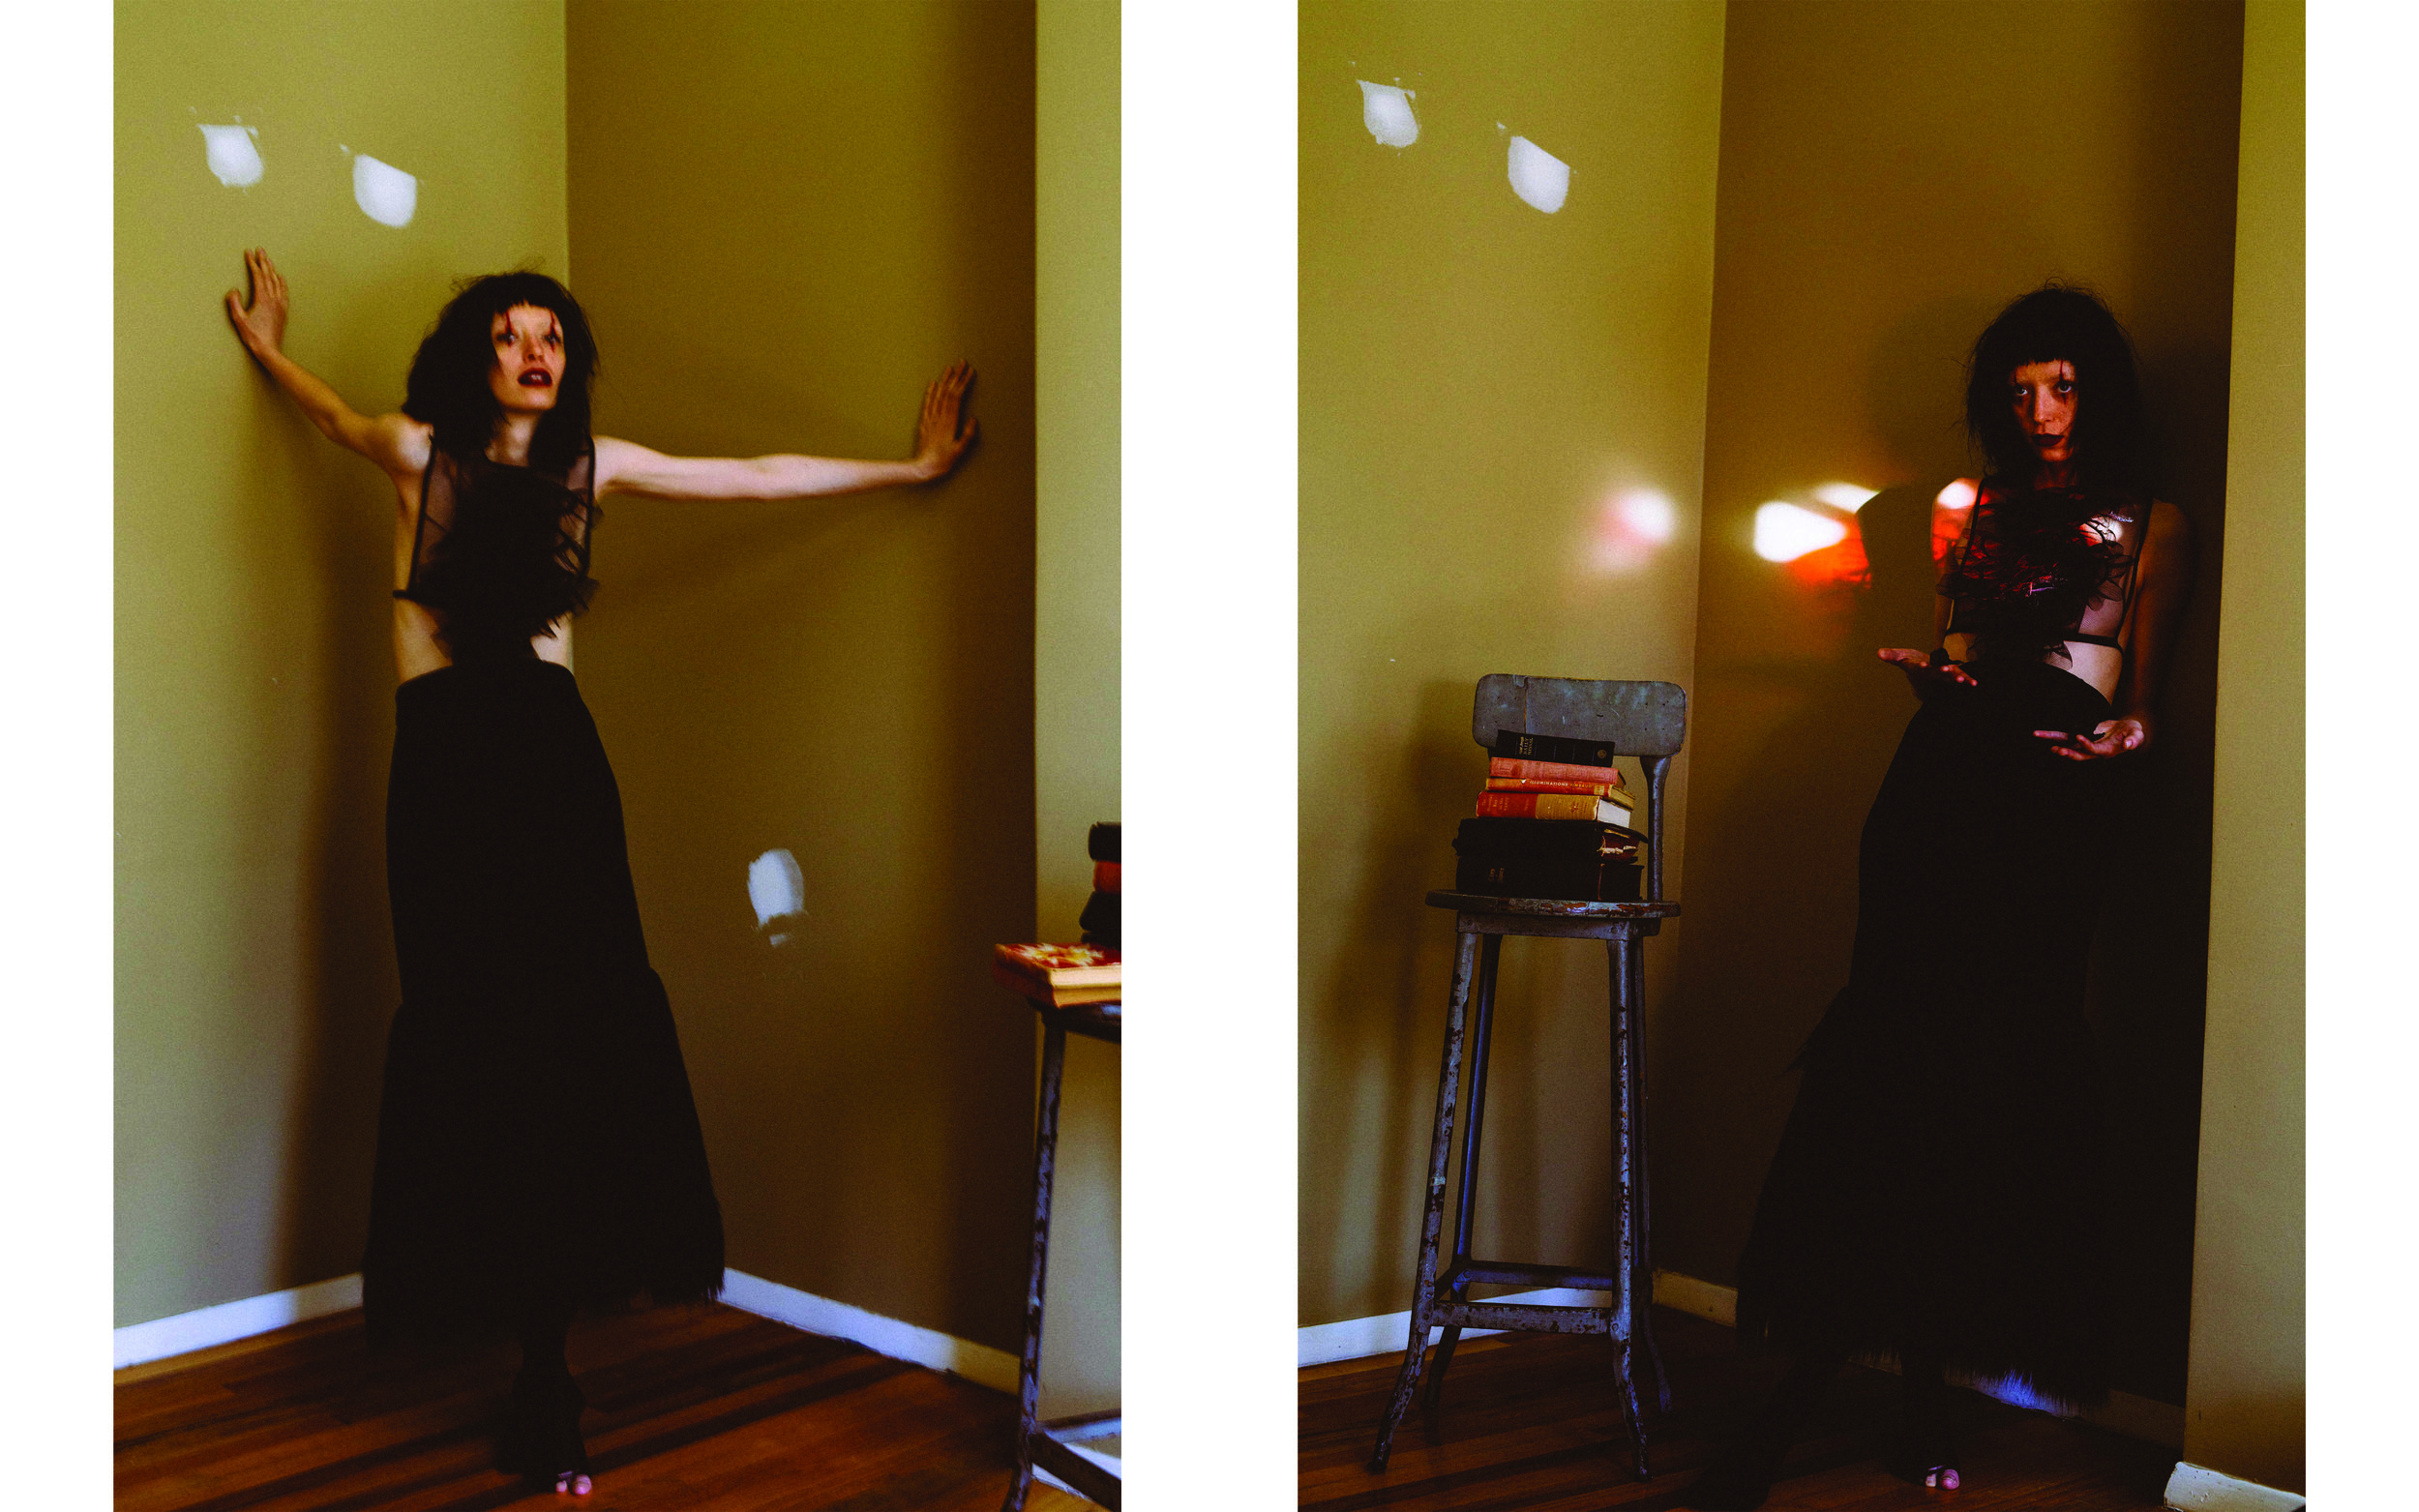 kelsey randall black ruffle front tulle dickie top bib crop tie blouse shirt black suede long pencil skirt princess seams high waist faux fur hem skirt